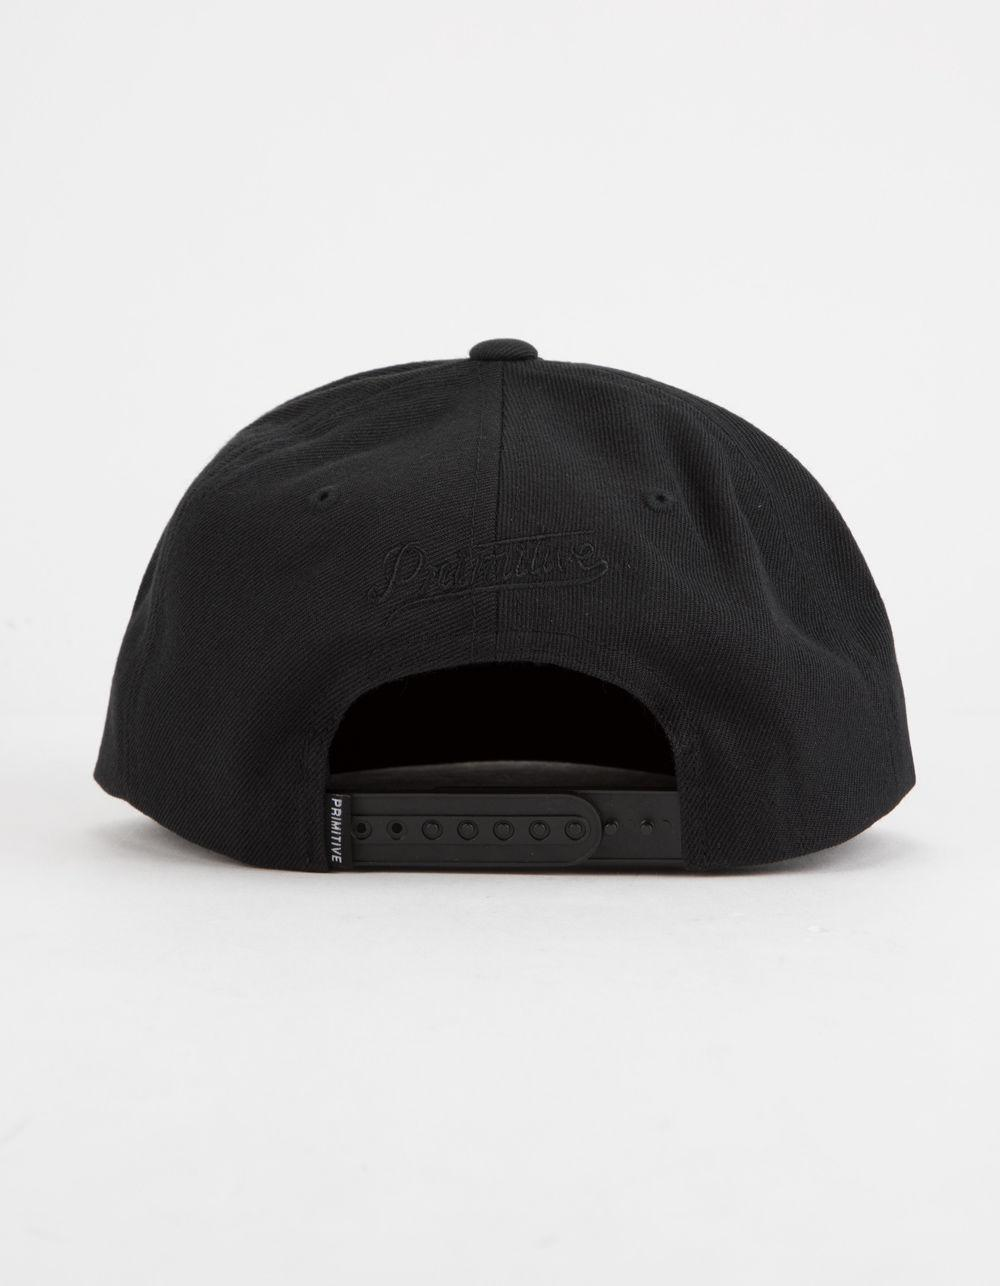 Lyst - Primitive Classic P Mens Snapback Hat in Black for Men 9103c2a2bf8